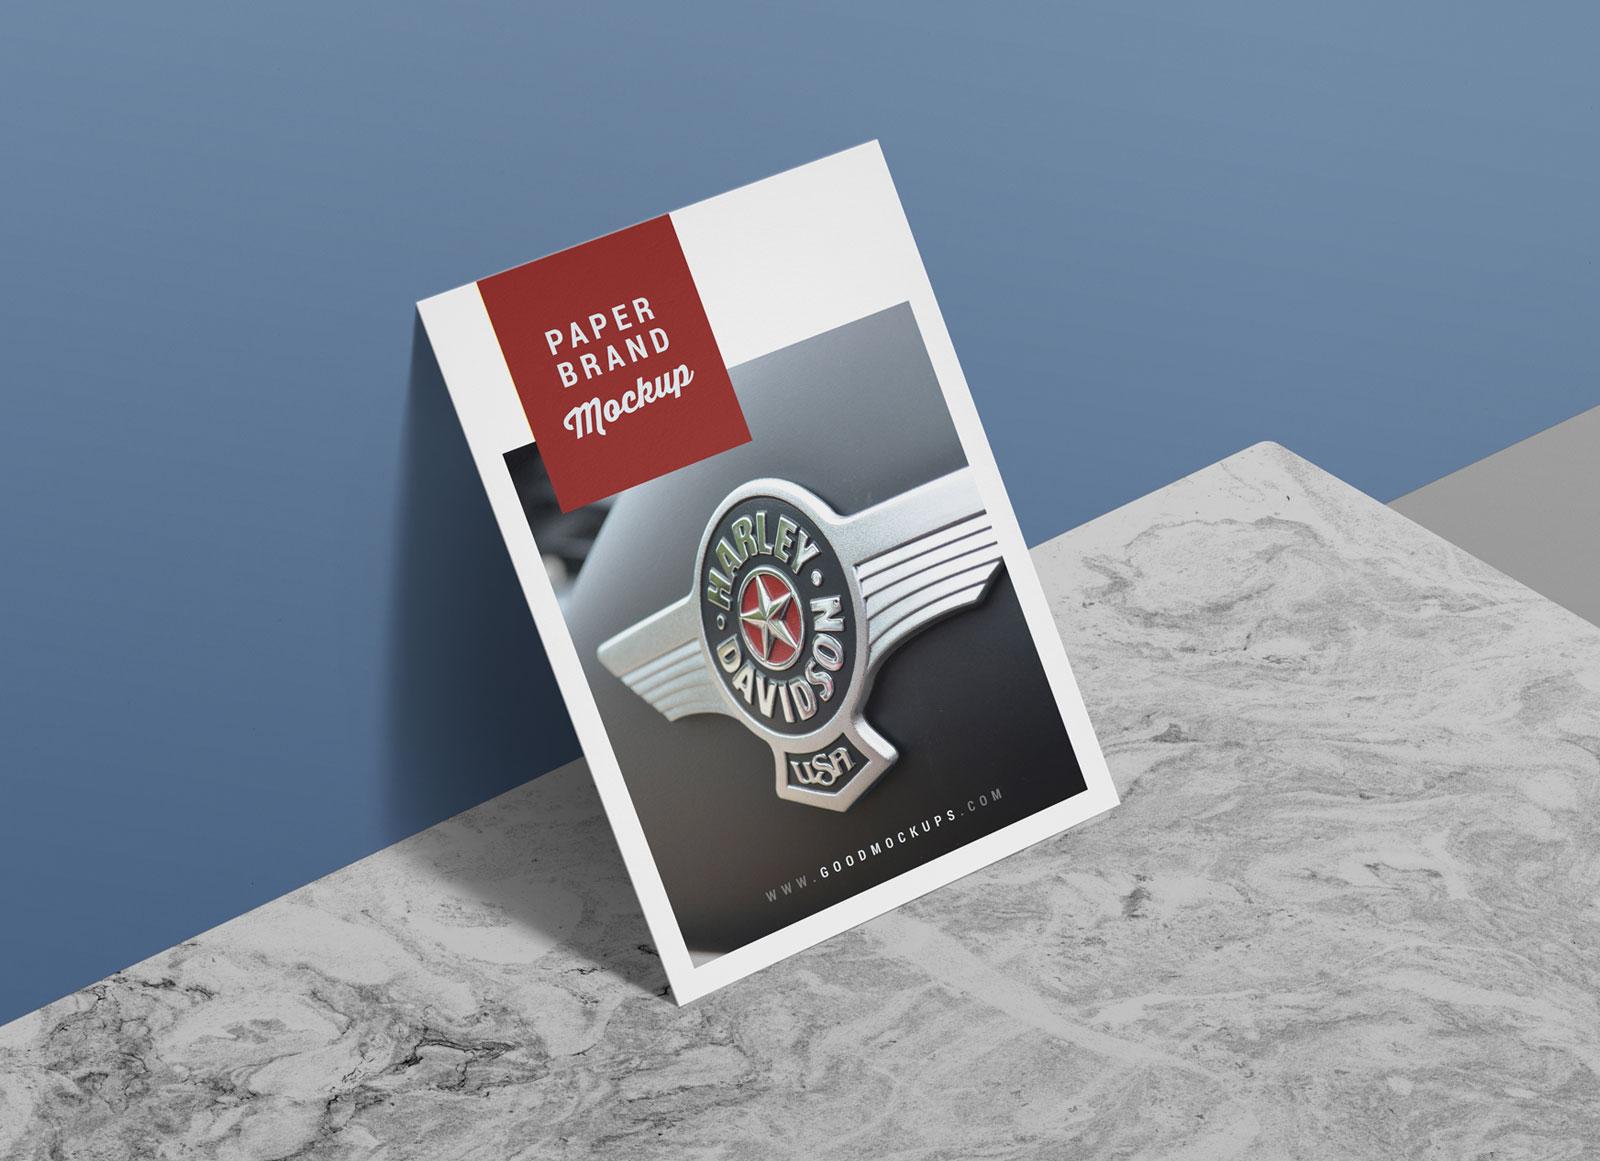 Free-Cardboard-Paper-Brand-Mockup-PSD